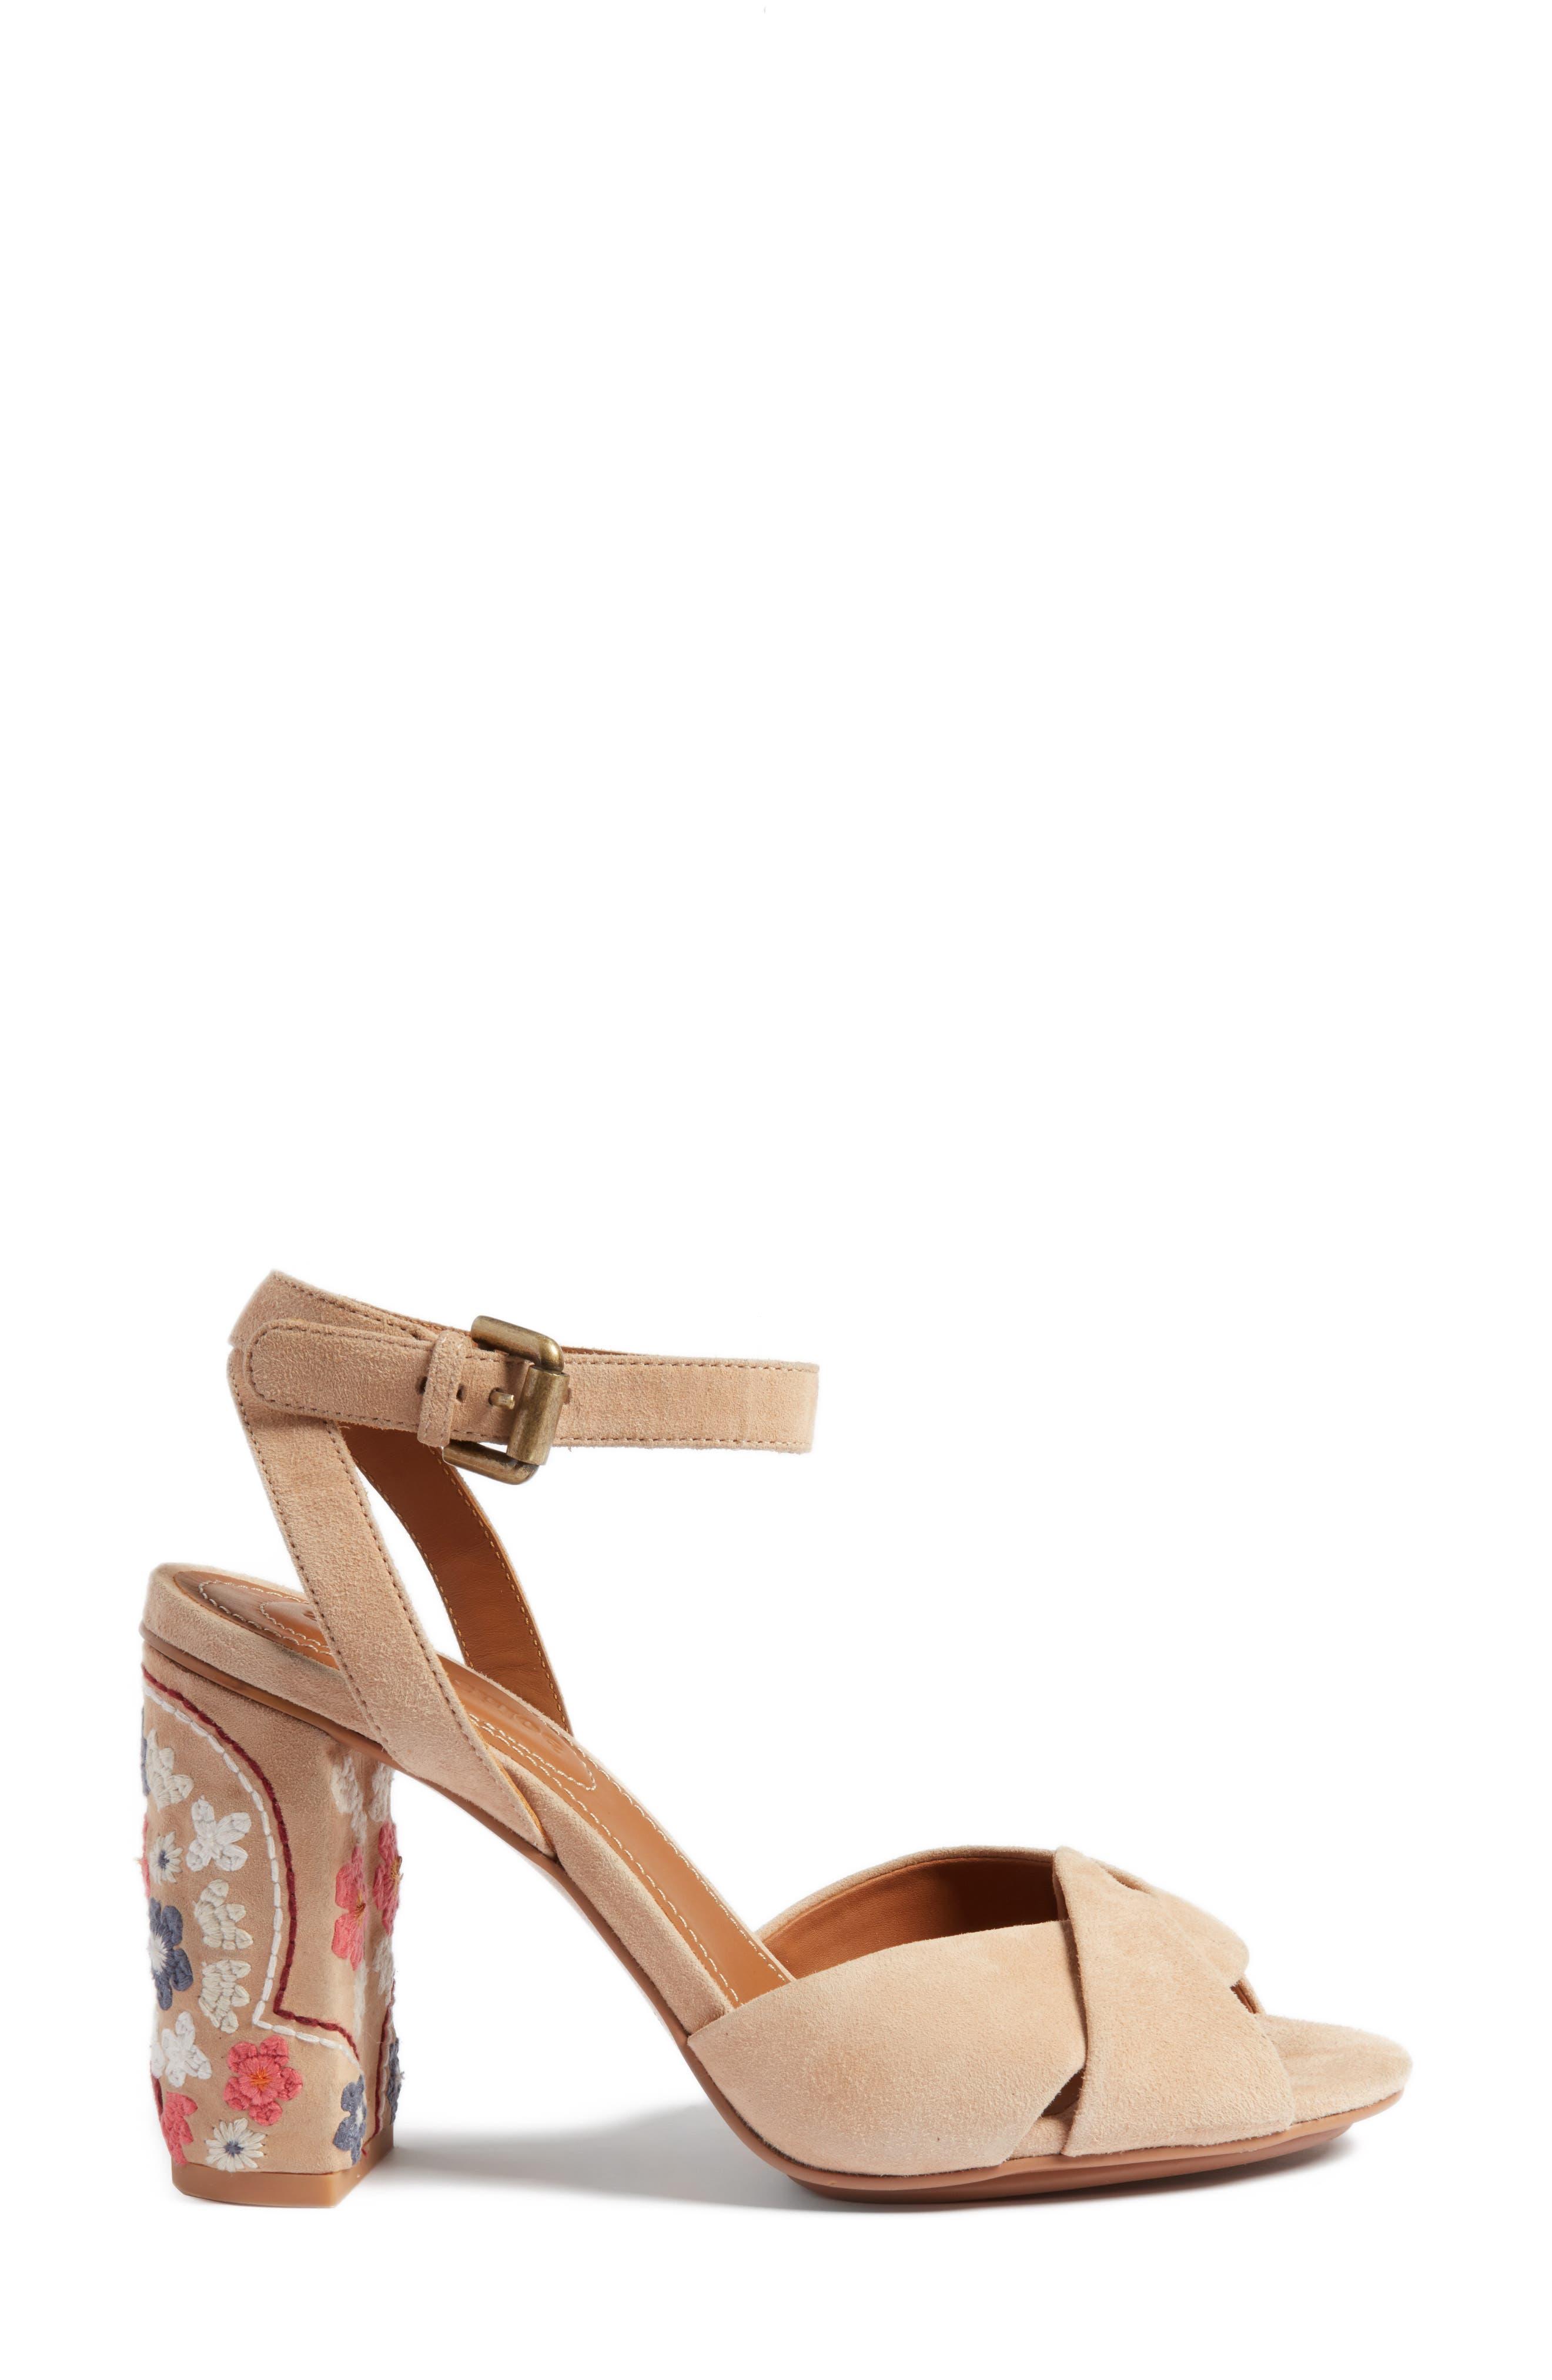 Gayla Embroidered Block Heel Sandal,                             Alternate thumbnail 3, color,                             250